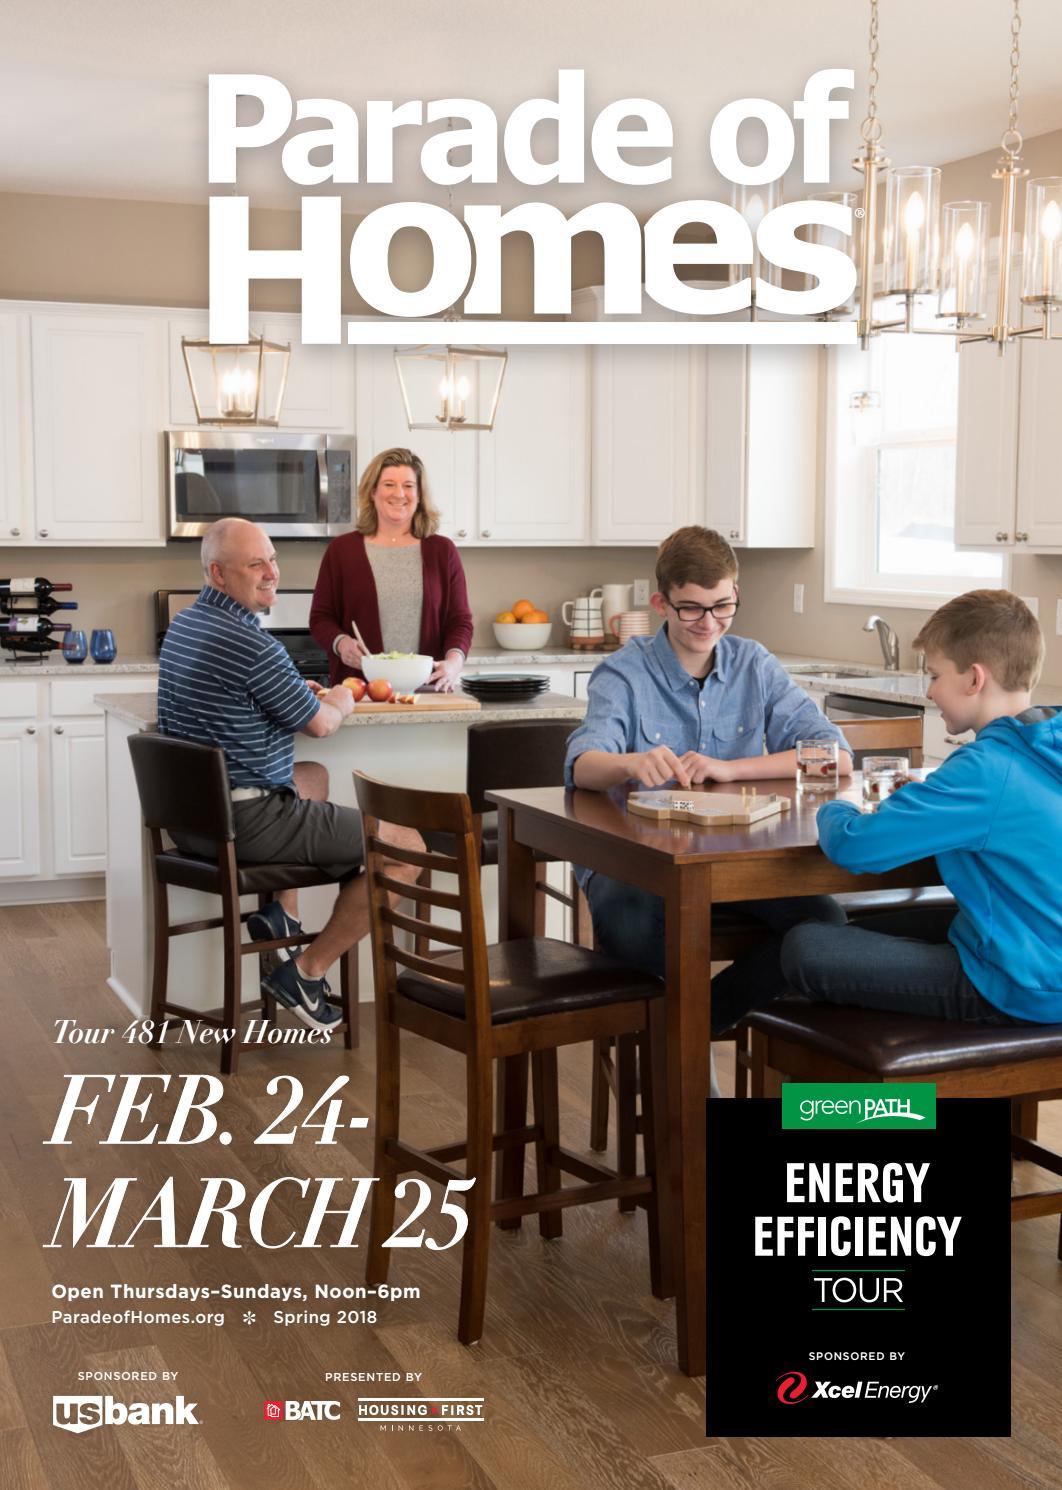 c4f741140b60 2018 Spring Parade of Homes(SM) guidebook by BATC-Housing First Minnesota -  issuu